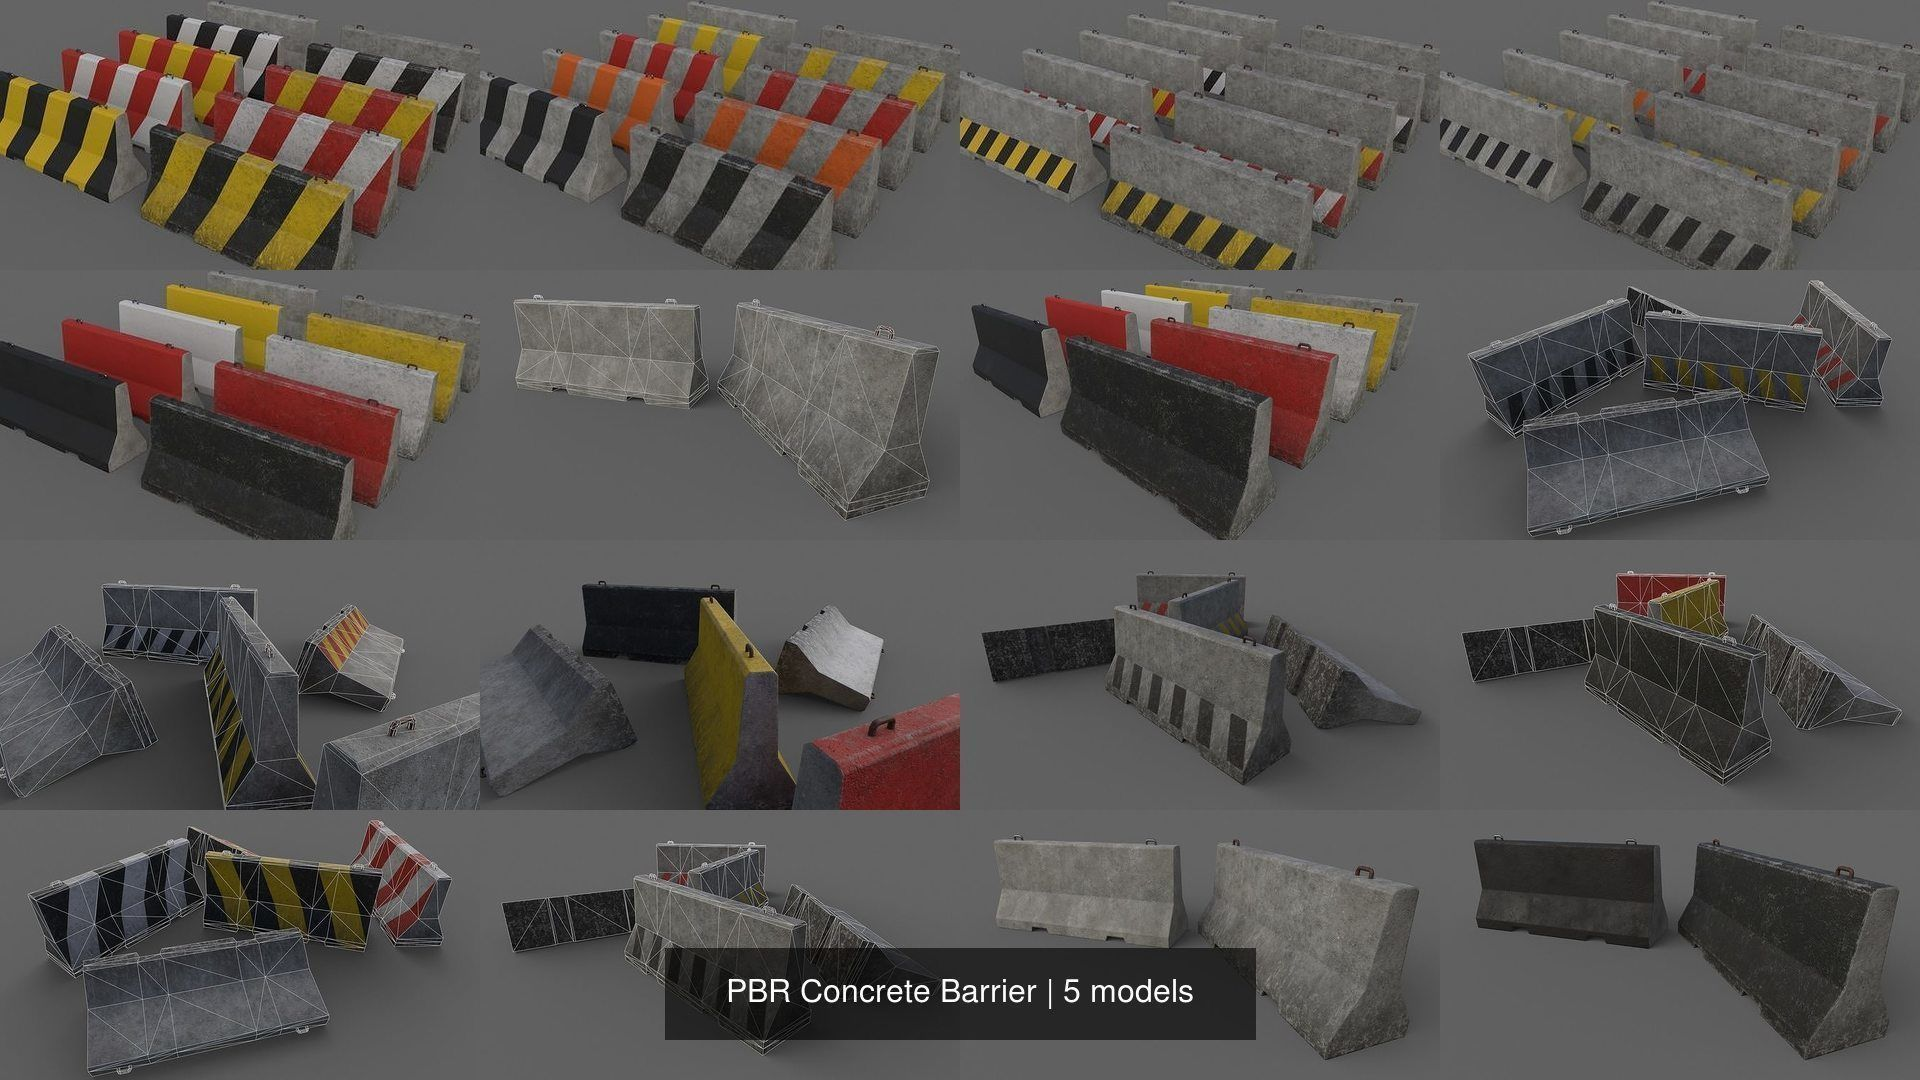 PBR Concrete Barrier